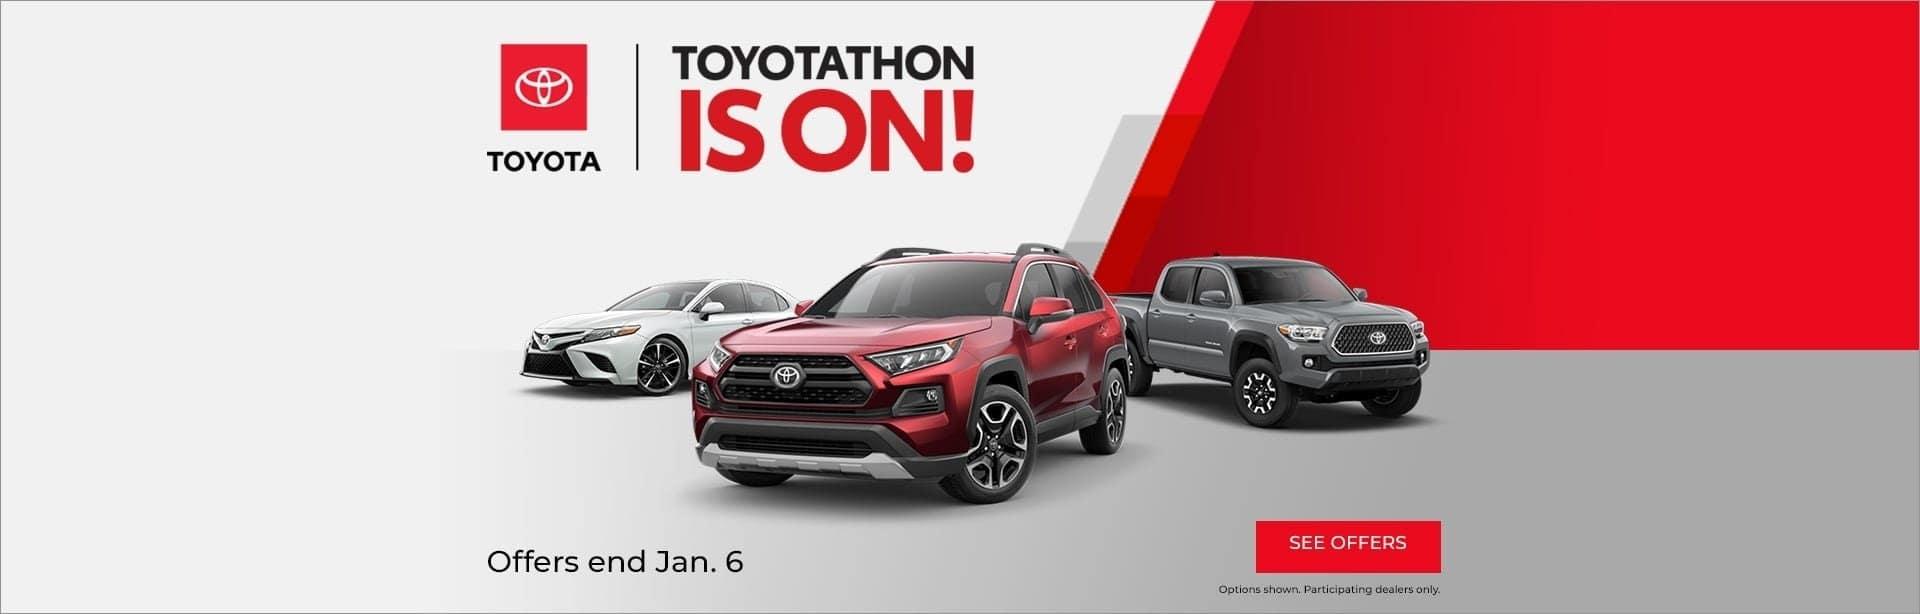 Toyotathon is On in Shreveport LA